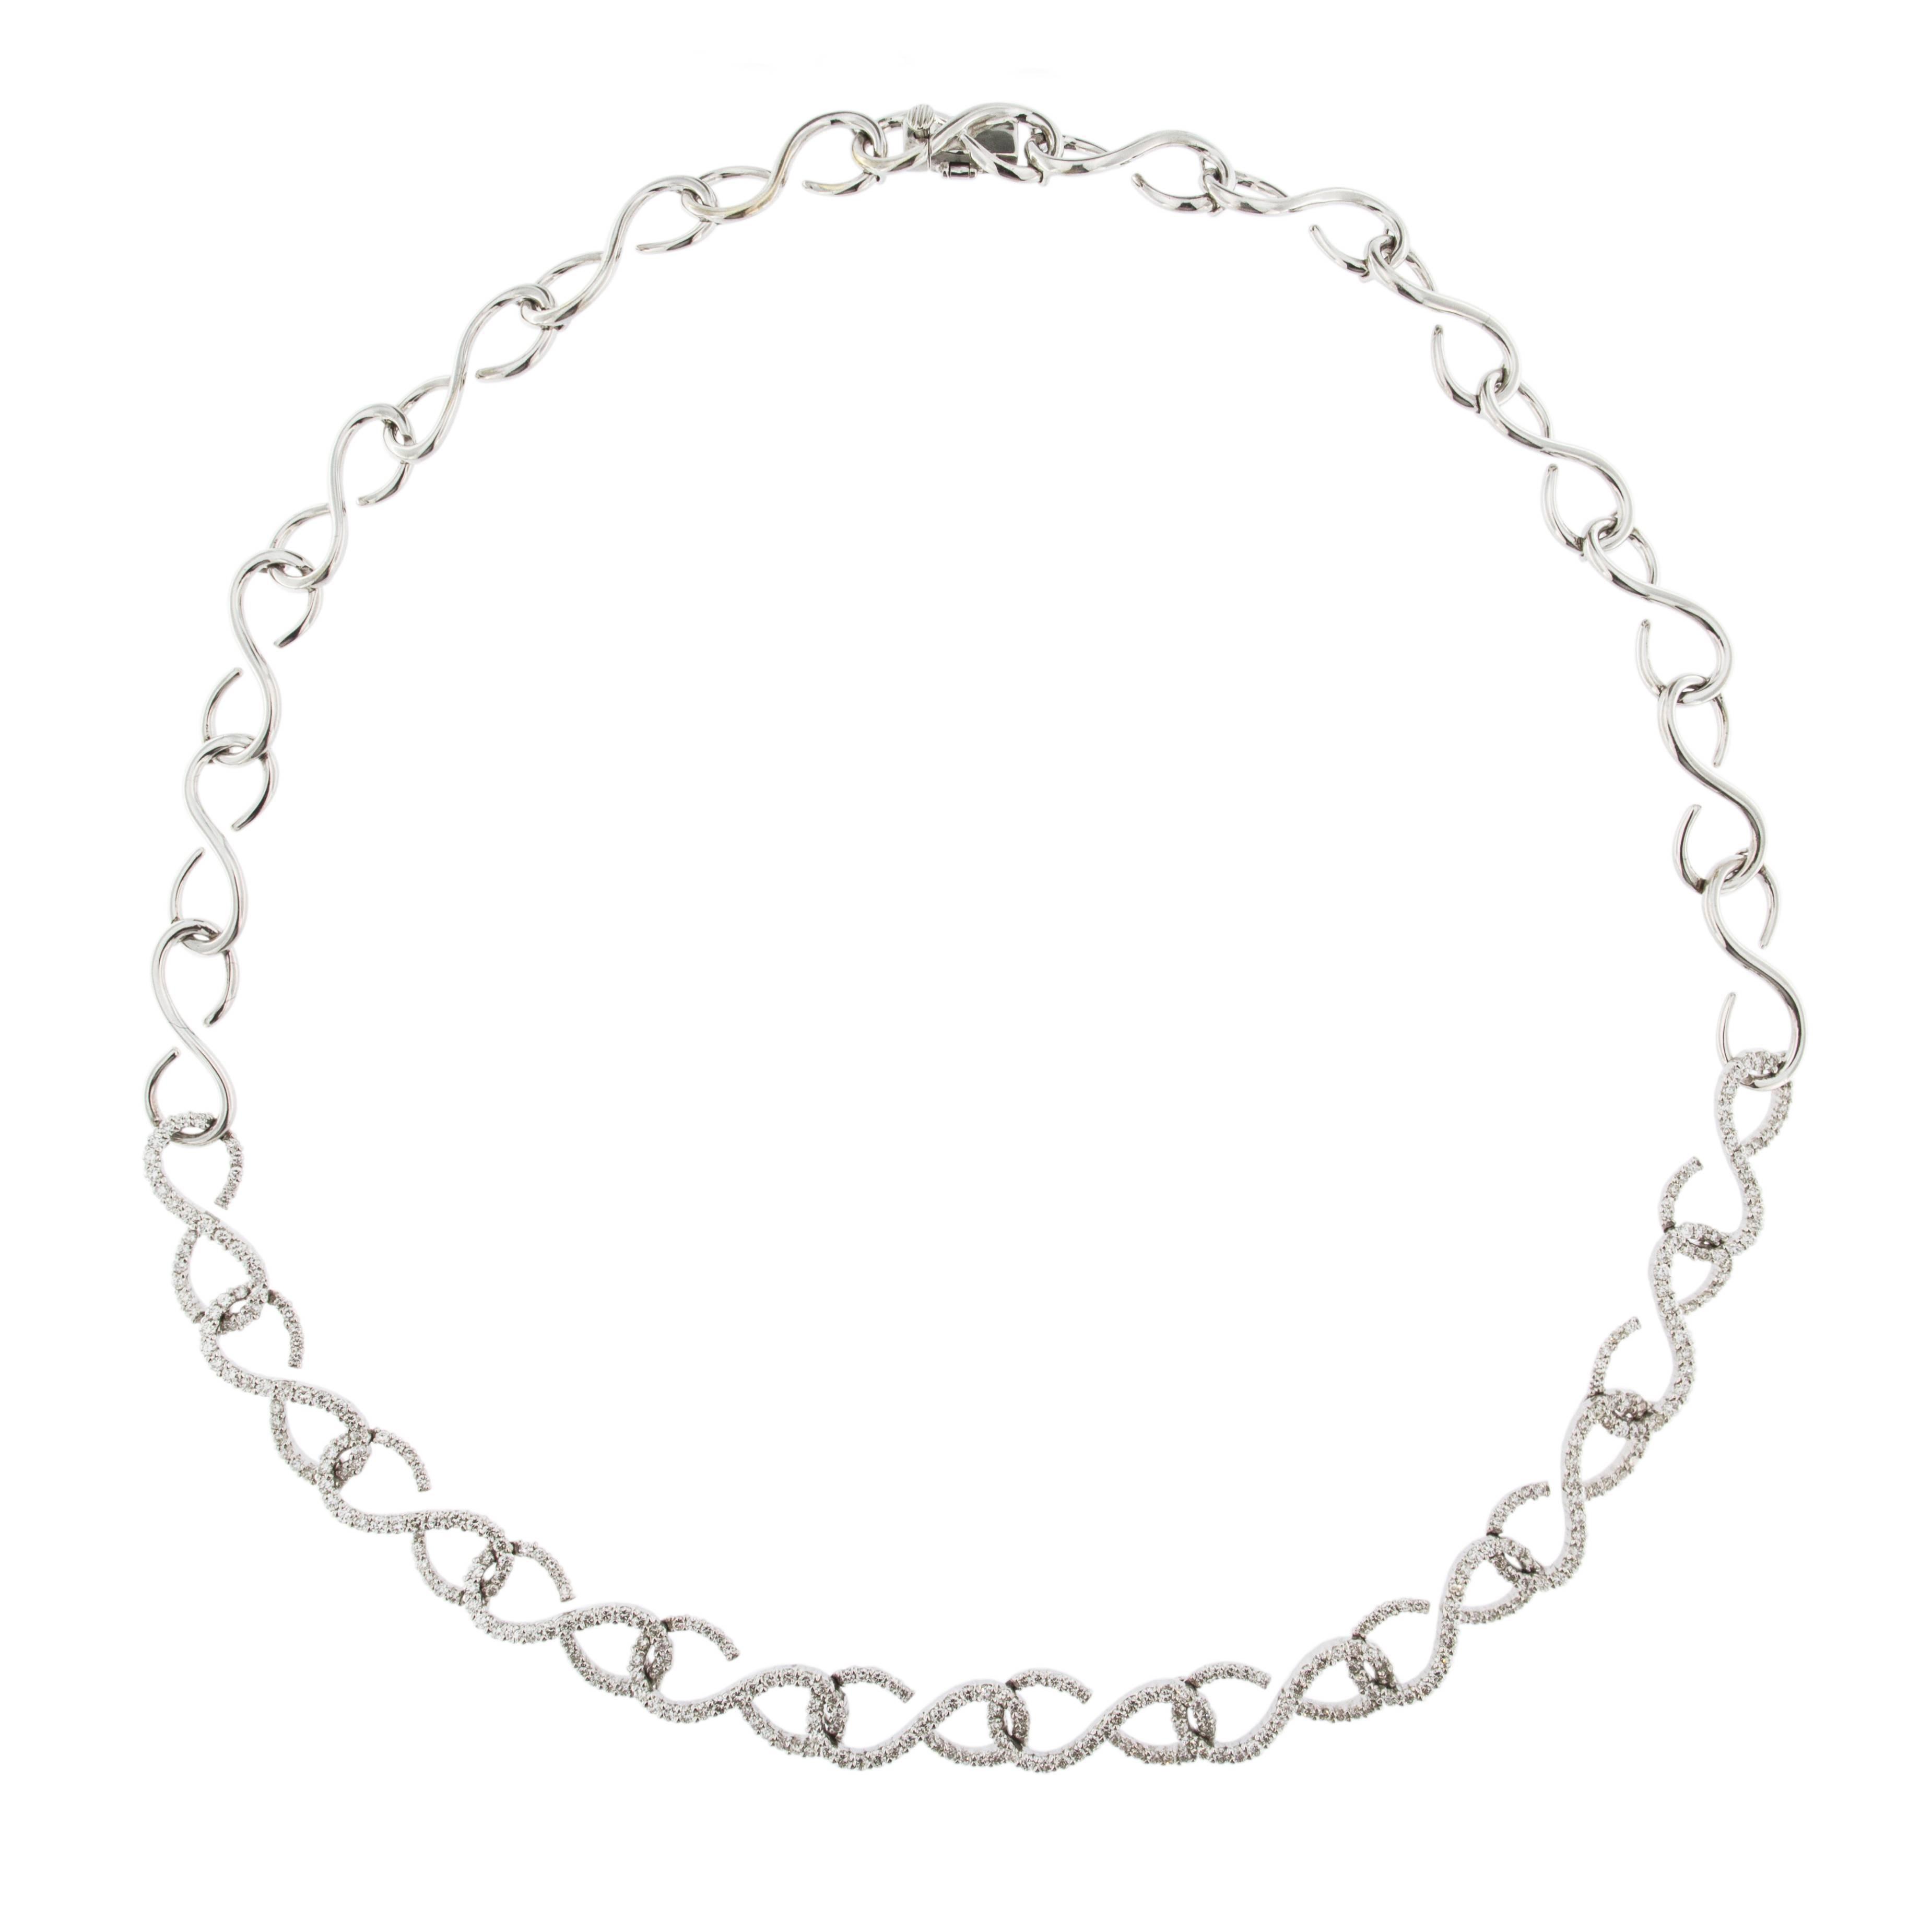 Jona White Diamond 18 Karat White Gold Link Necklace